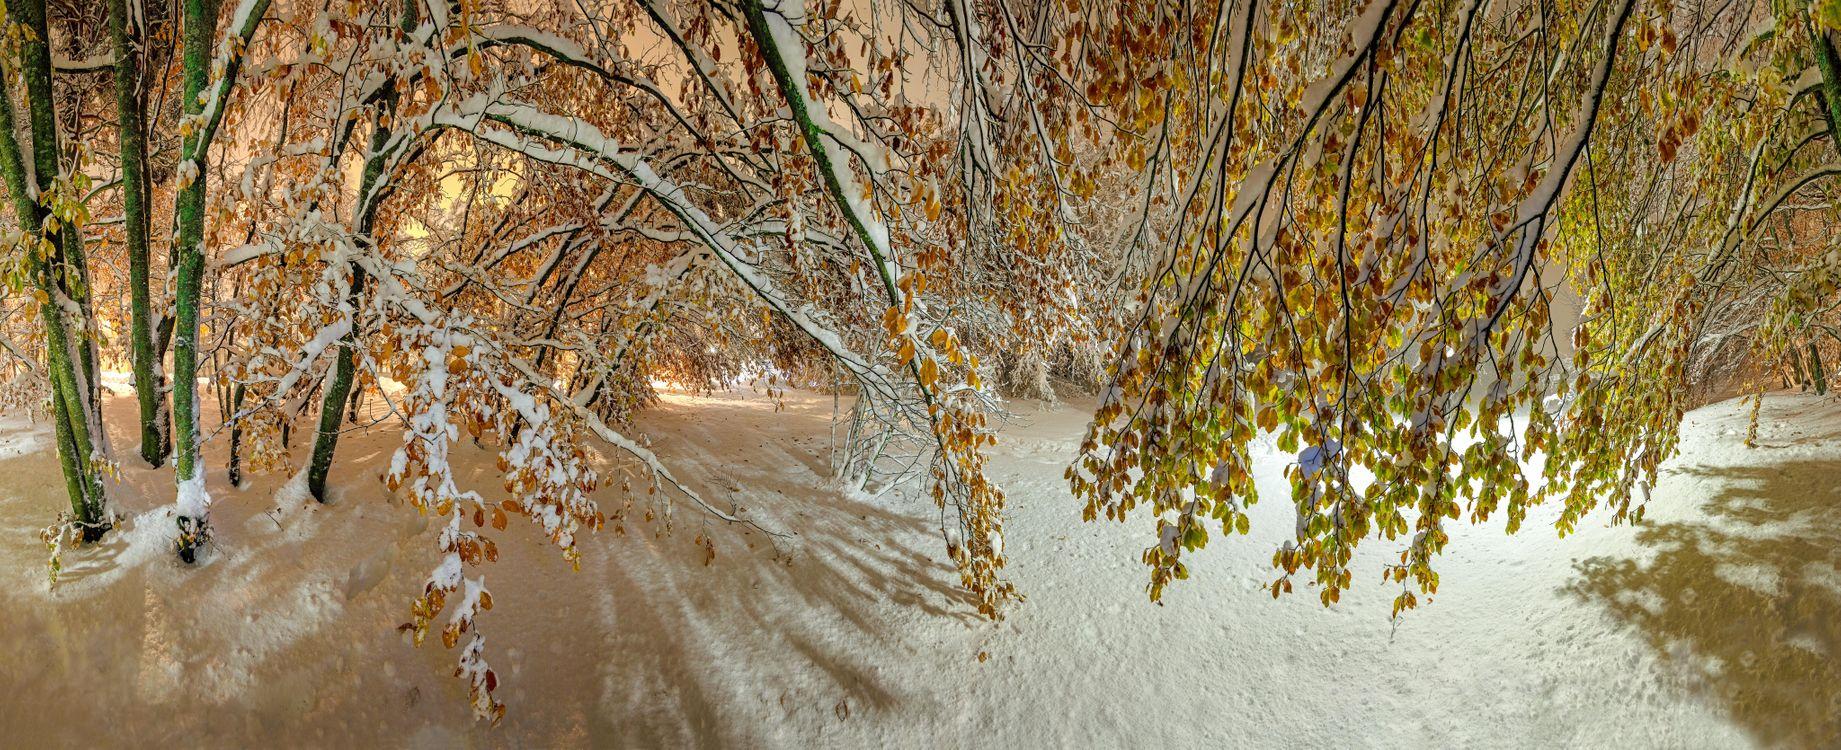 Фото бесплатно зима, парк, лес - на рабочий стол